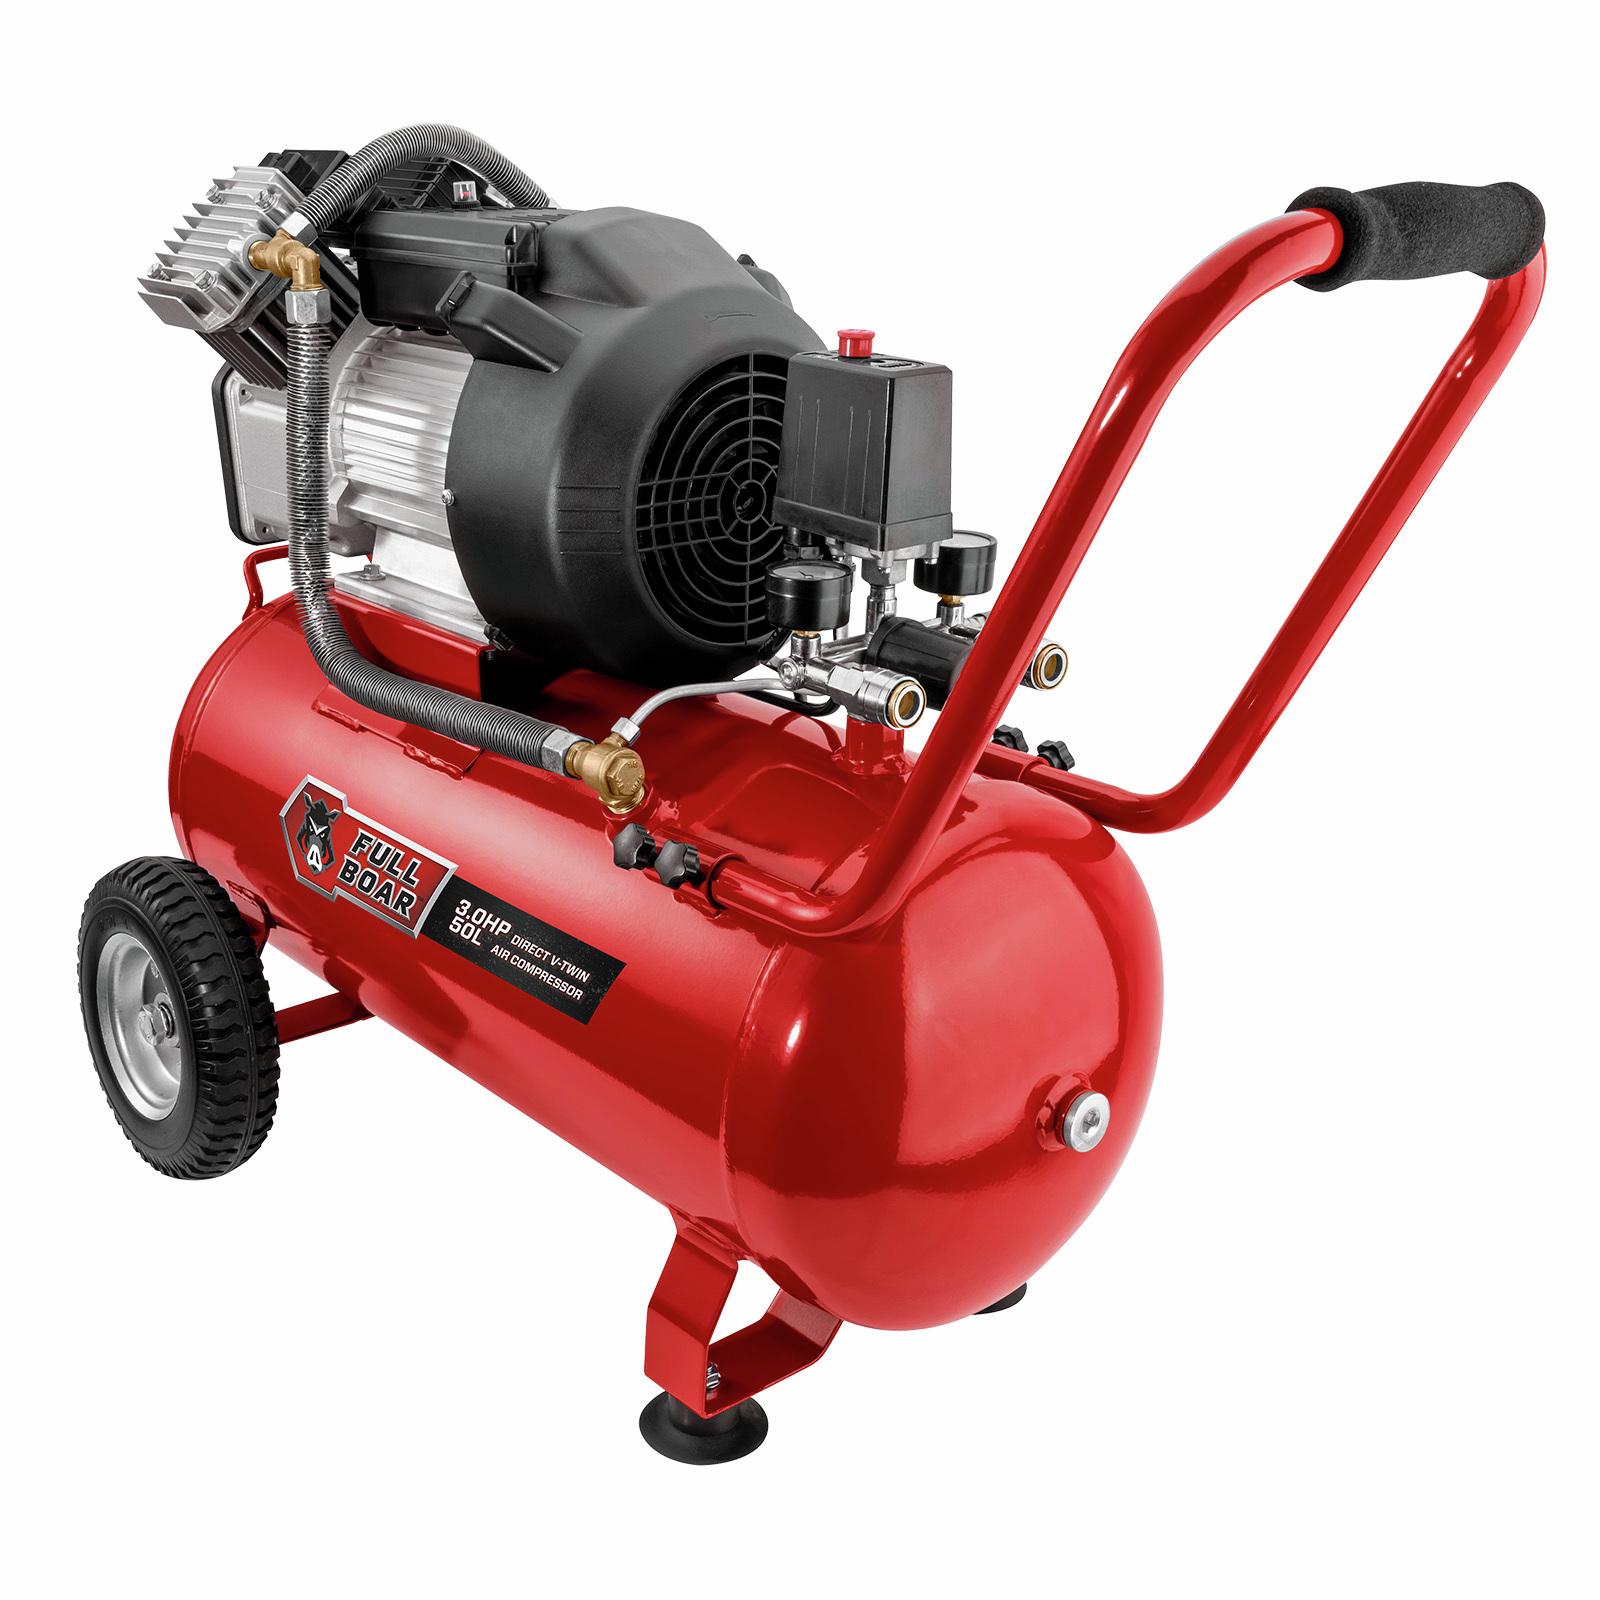 Full Boar 3HP 50L Oil Free V-Twin Air Compressor